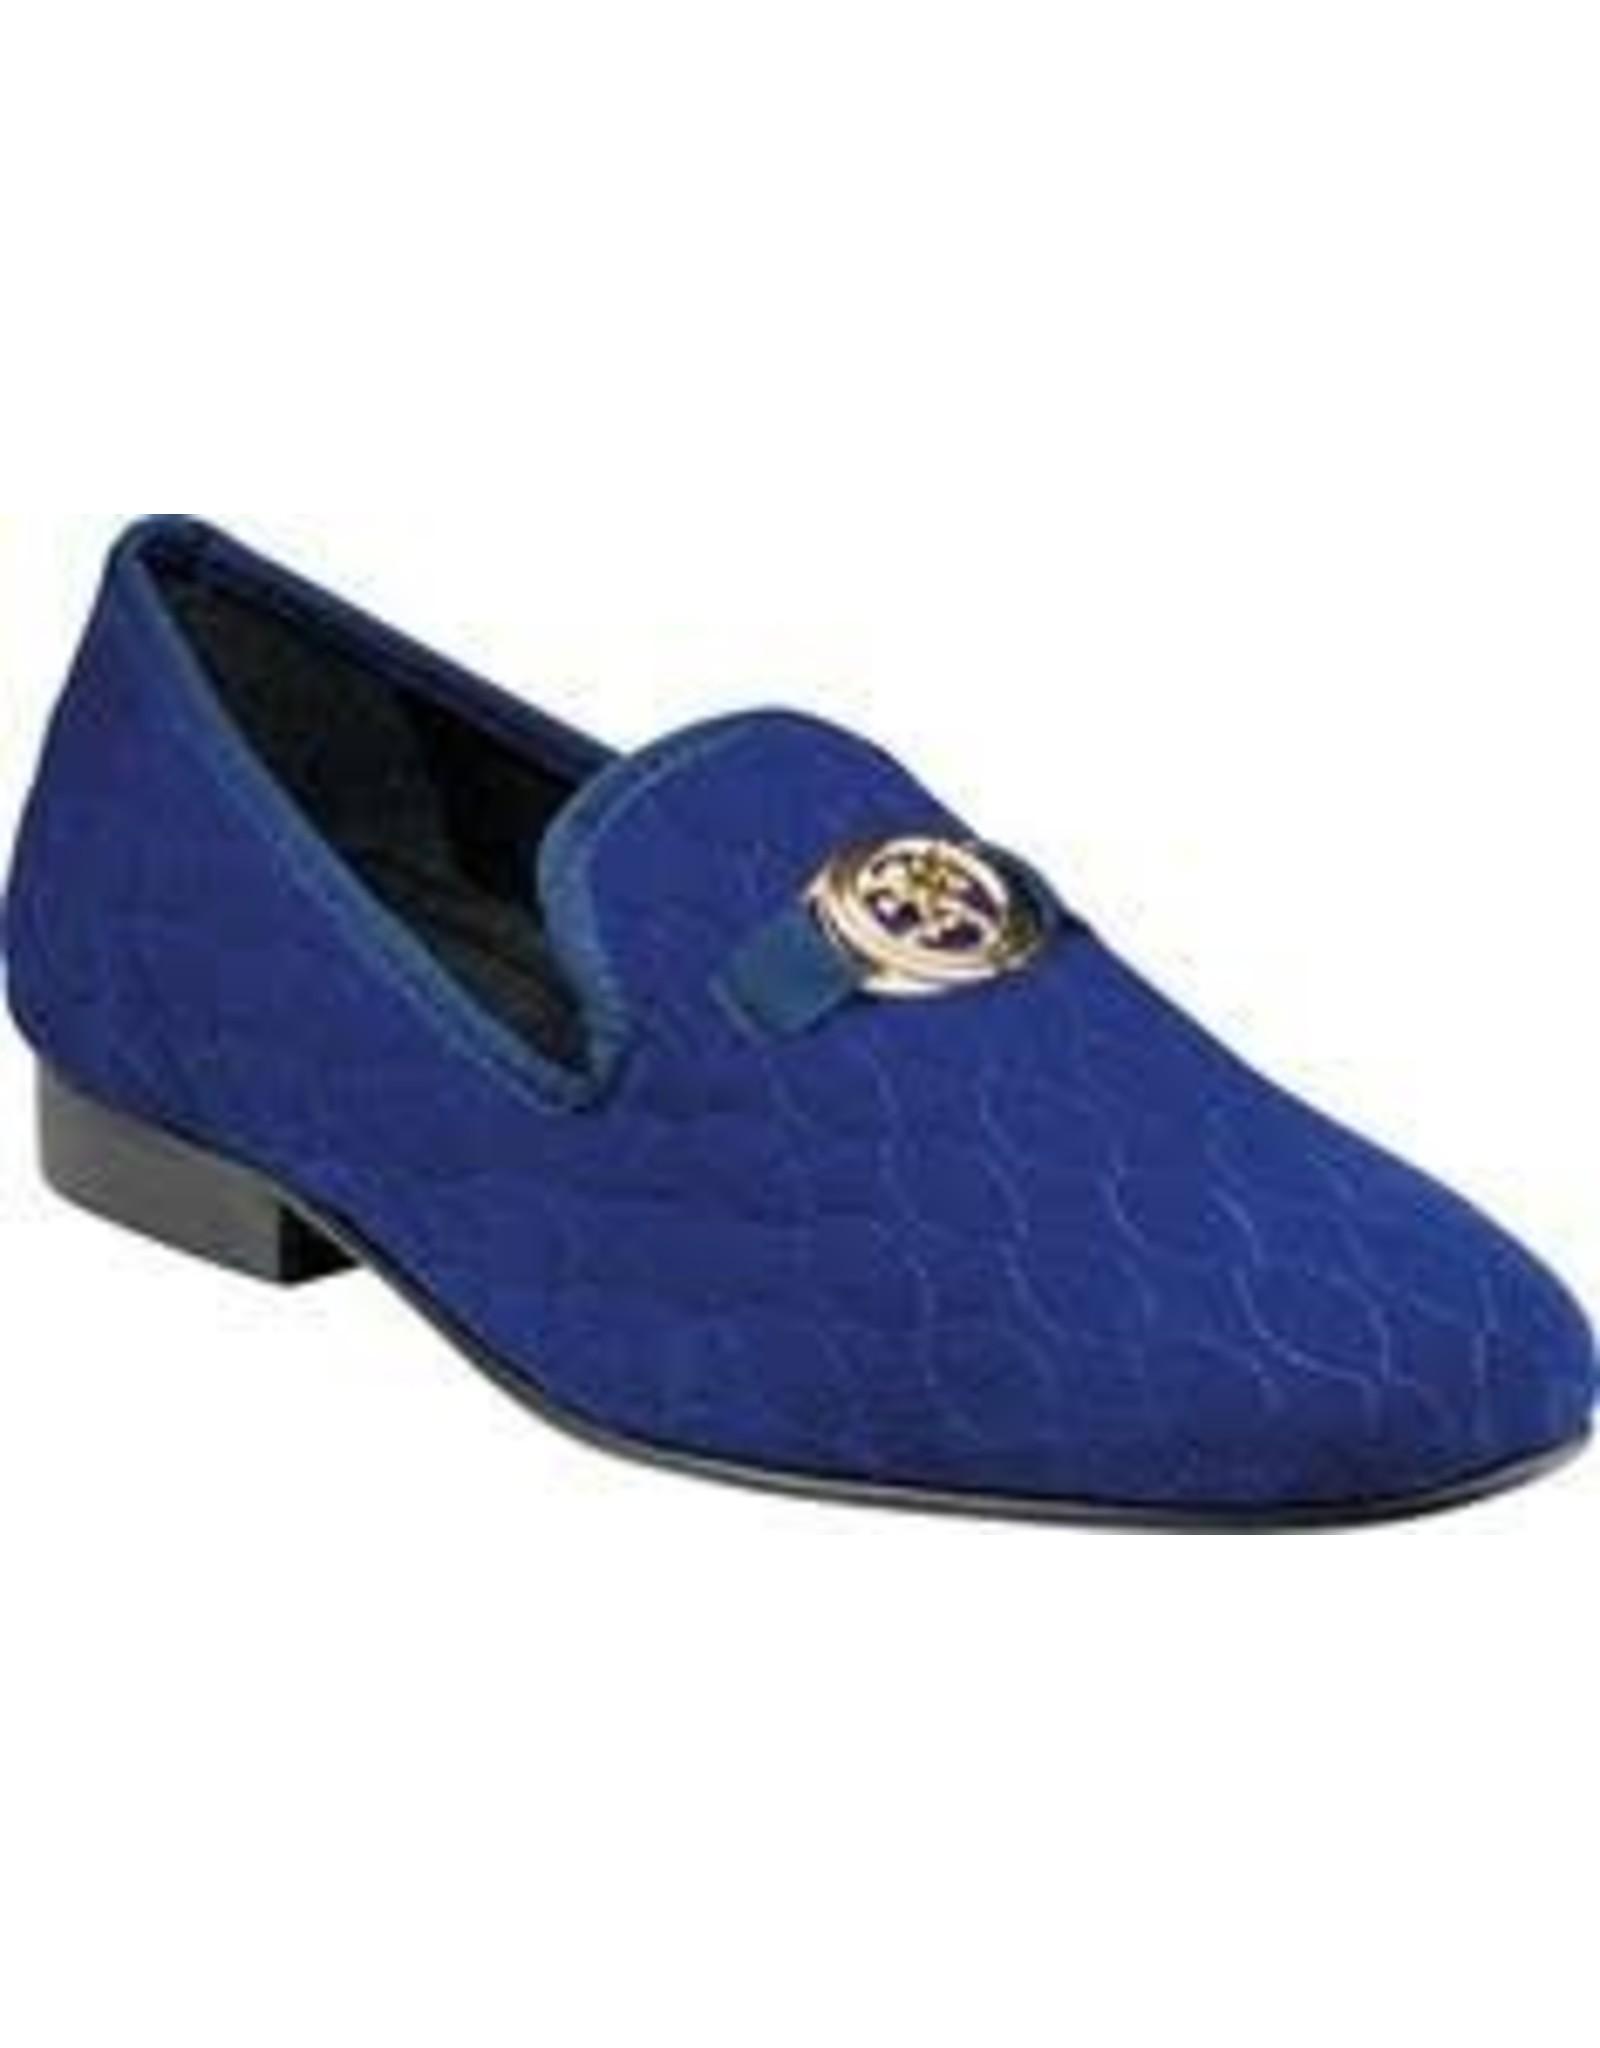 Stacy Adam Stacy Adams Valet Formal Shoe - 25166 Royal Blue